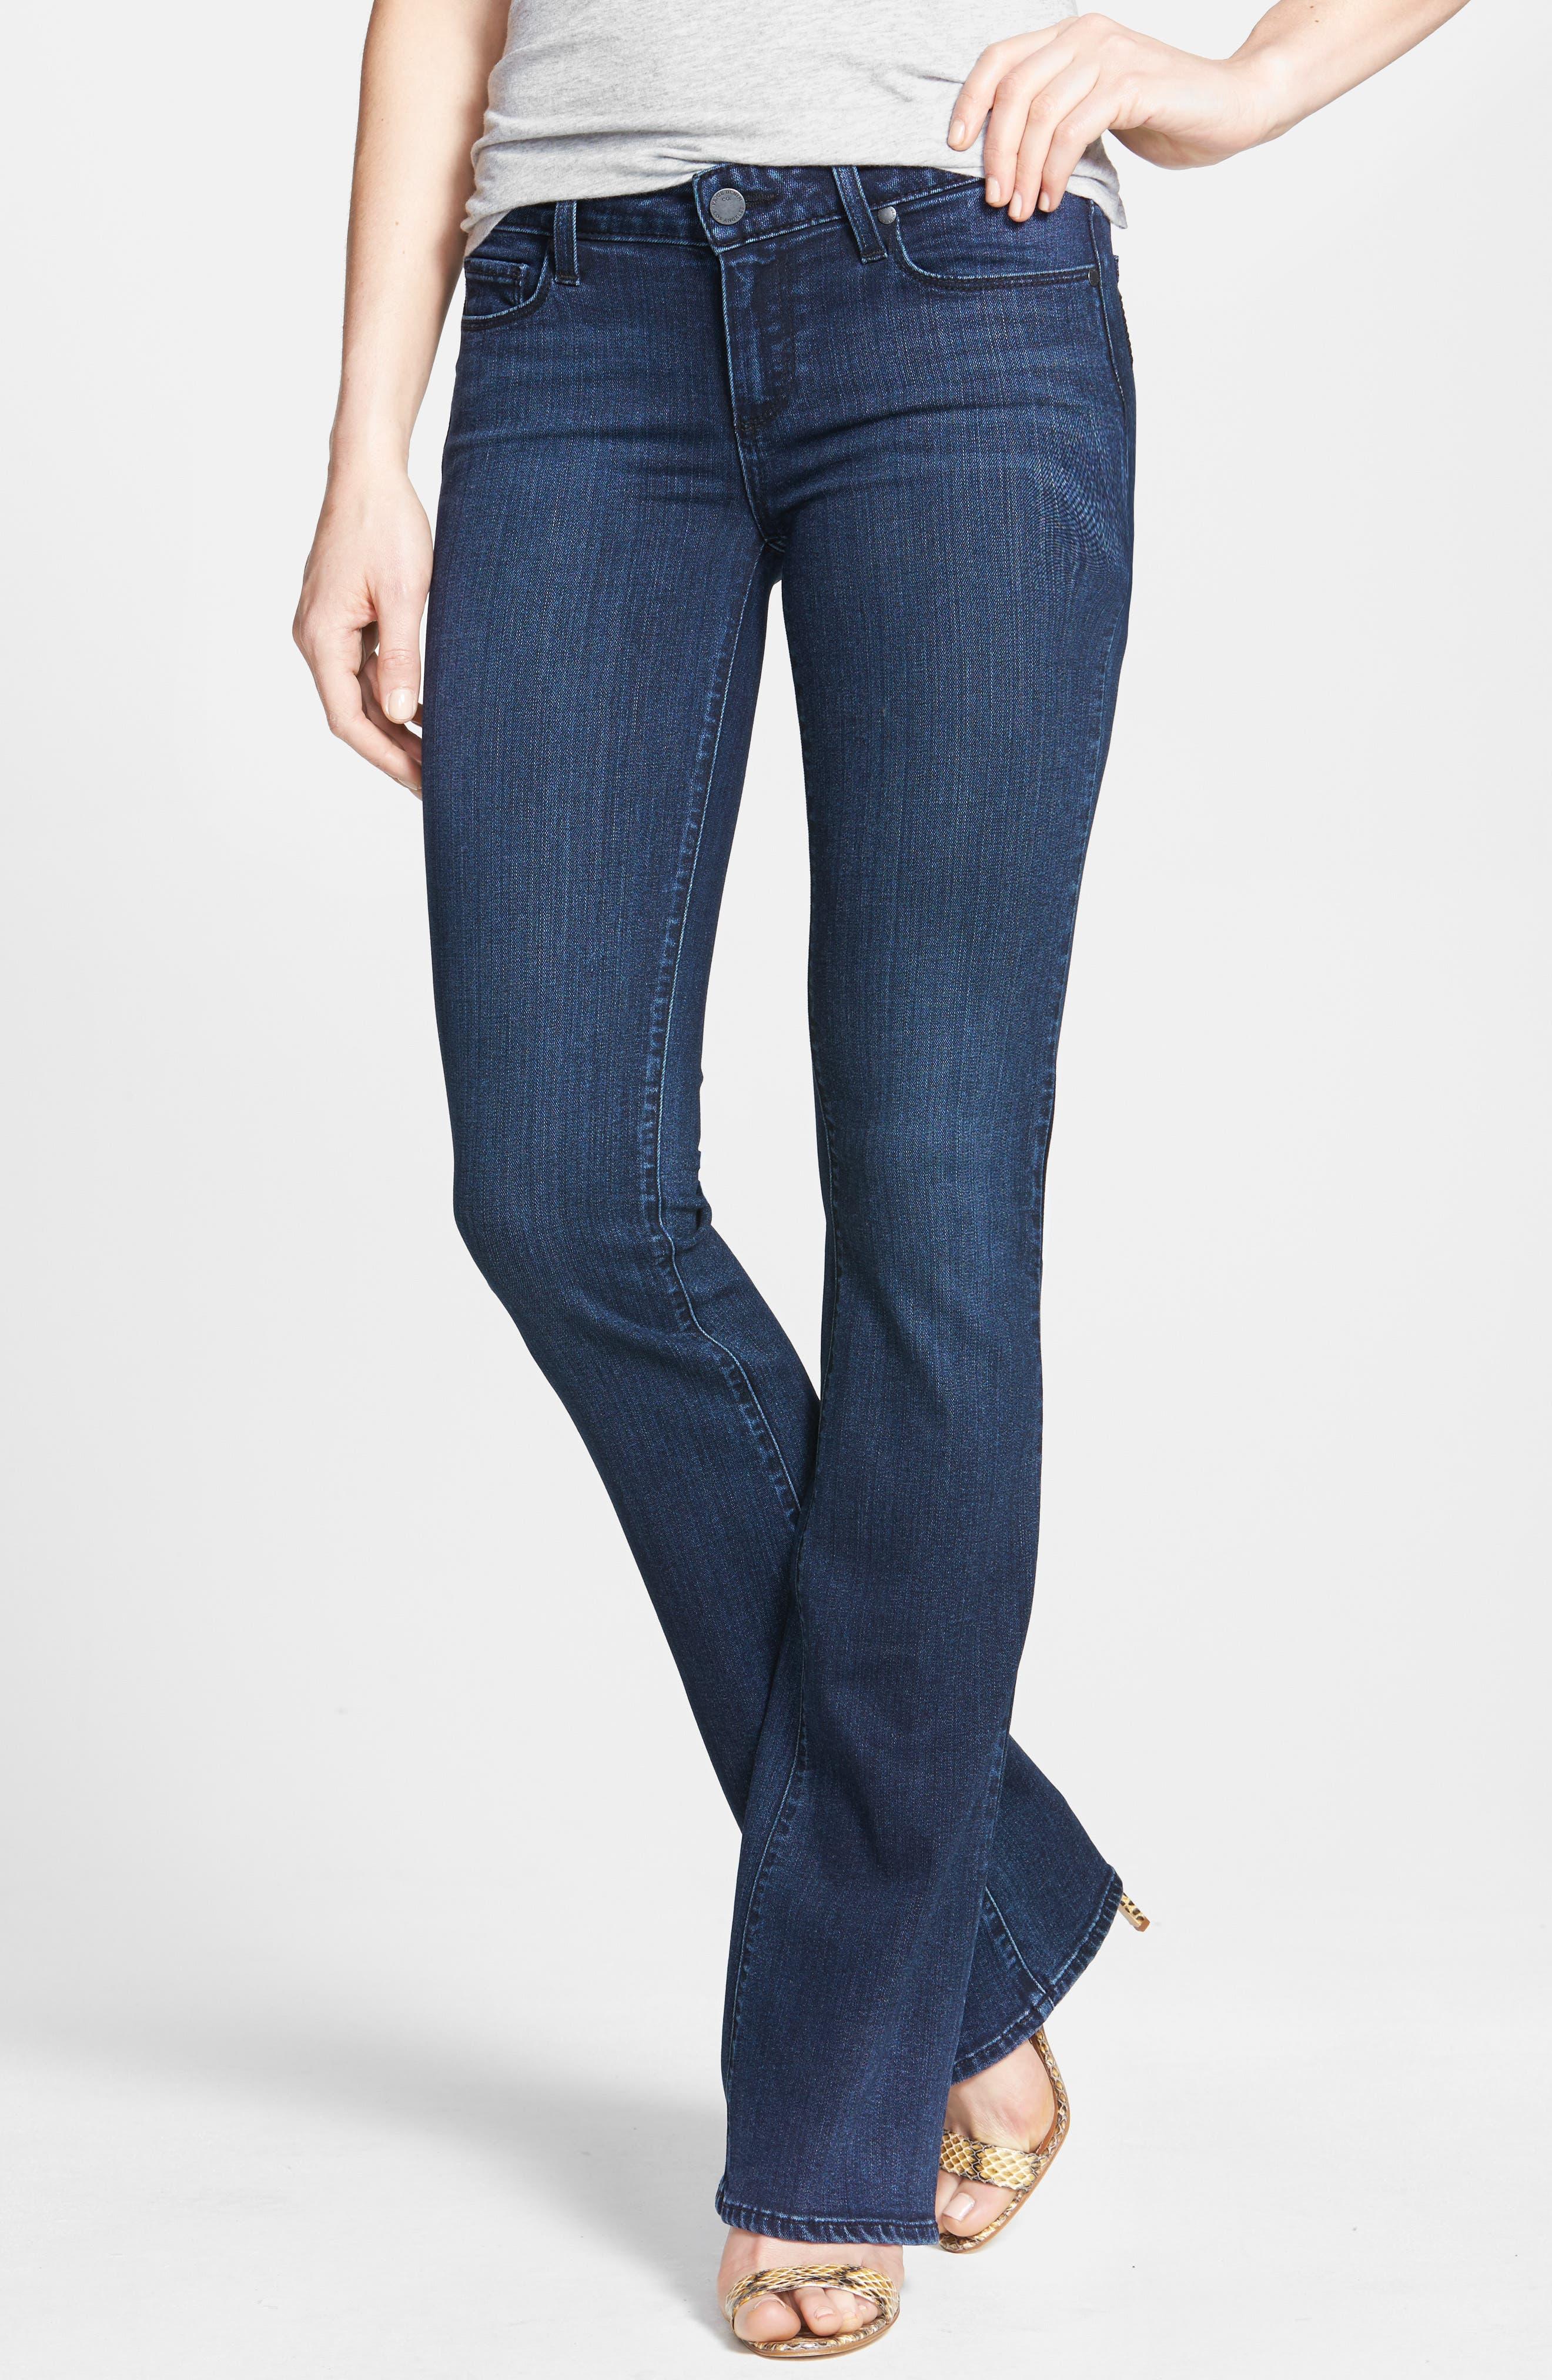 Transcend - Skyline Bootcut Jeans,                         Main,                         color, VALOR